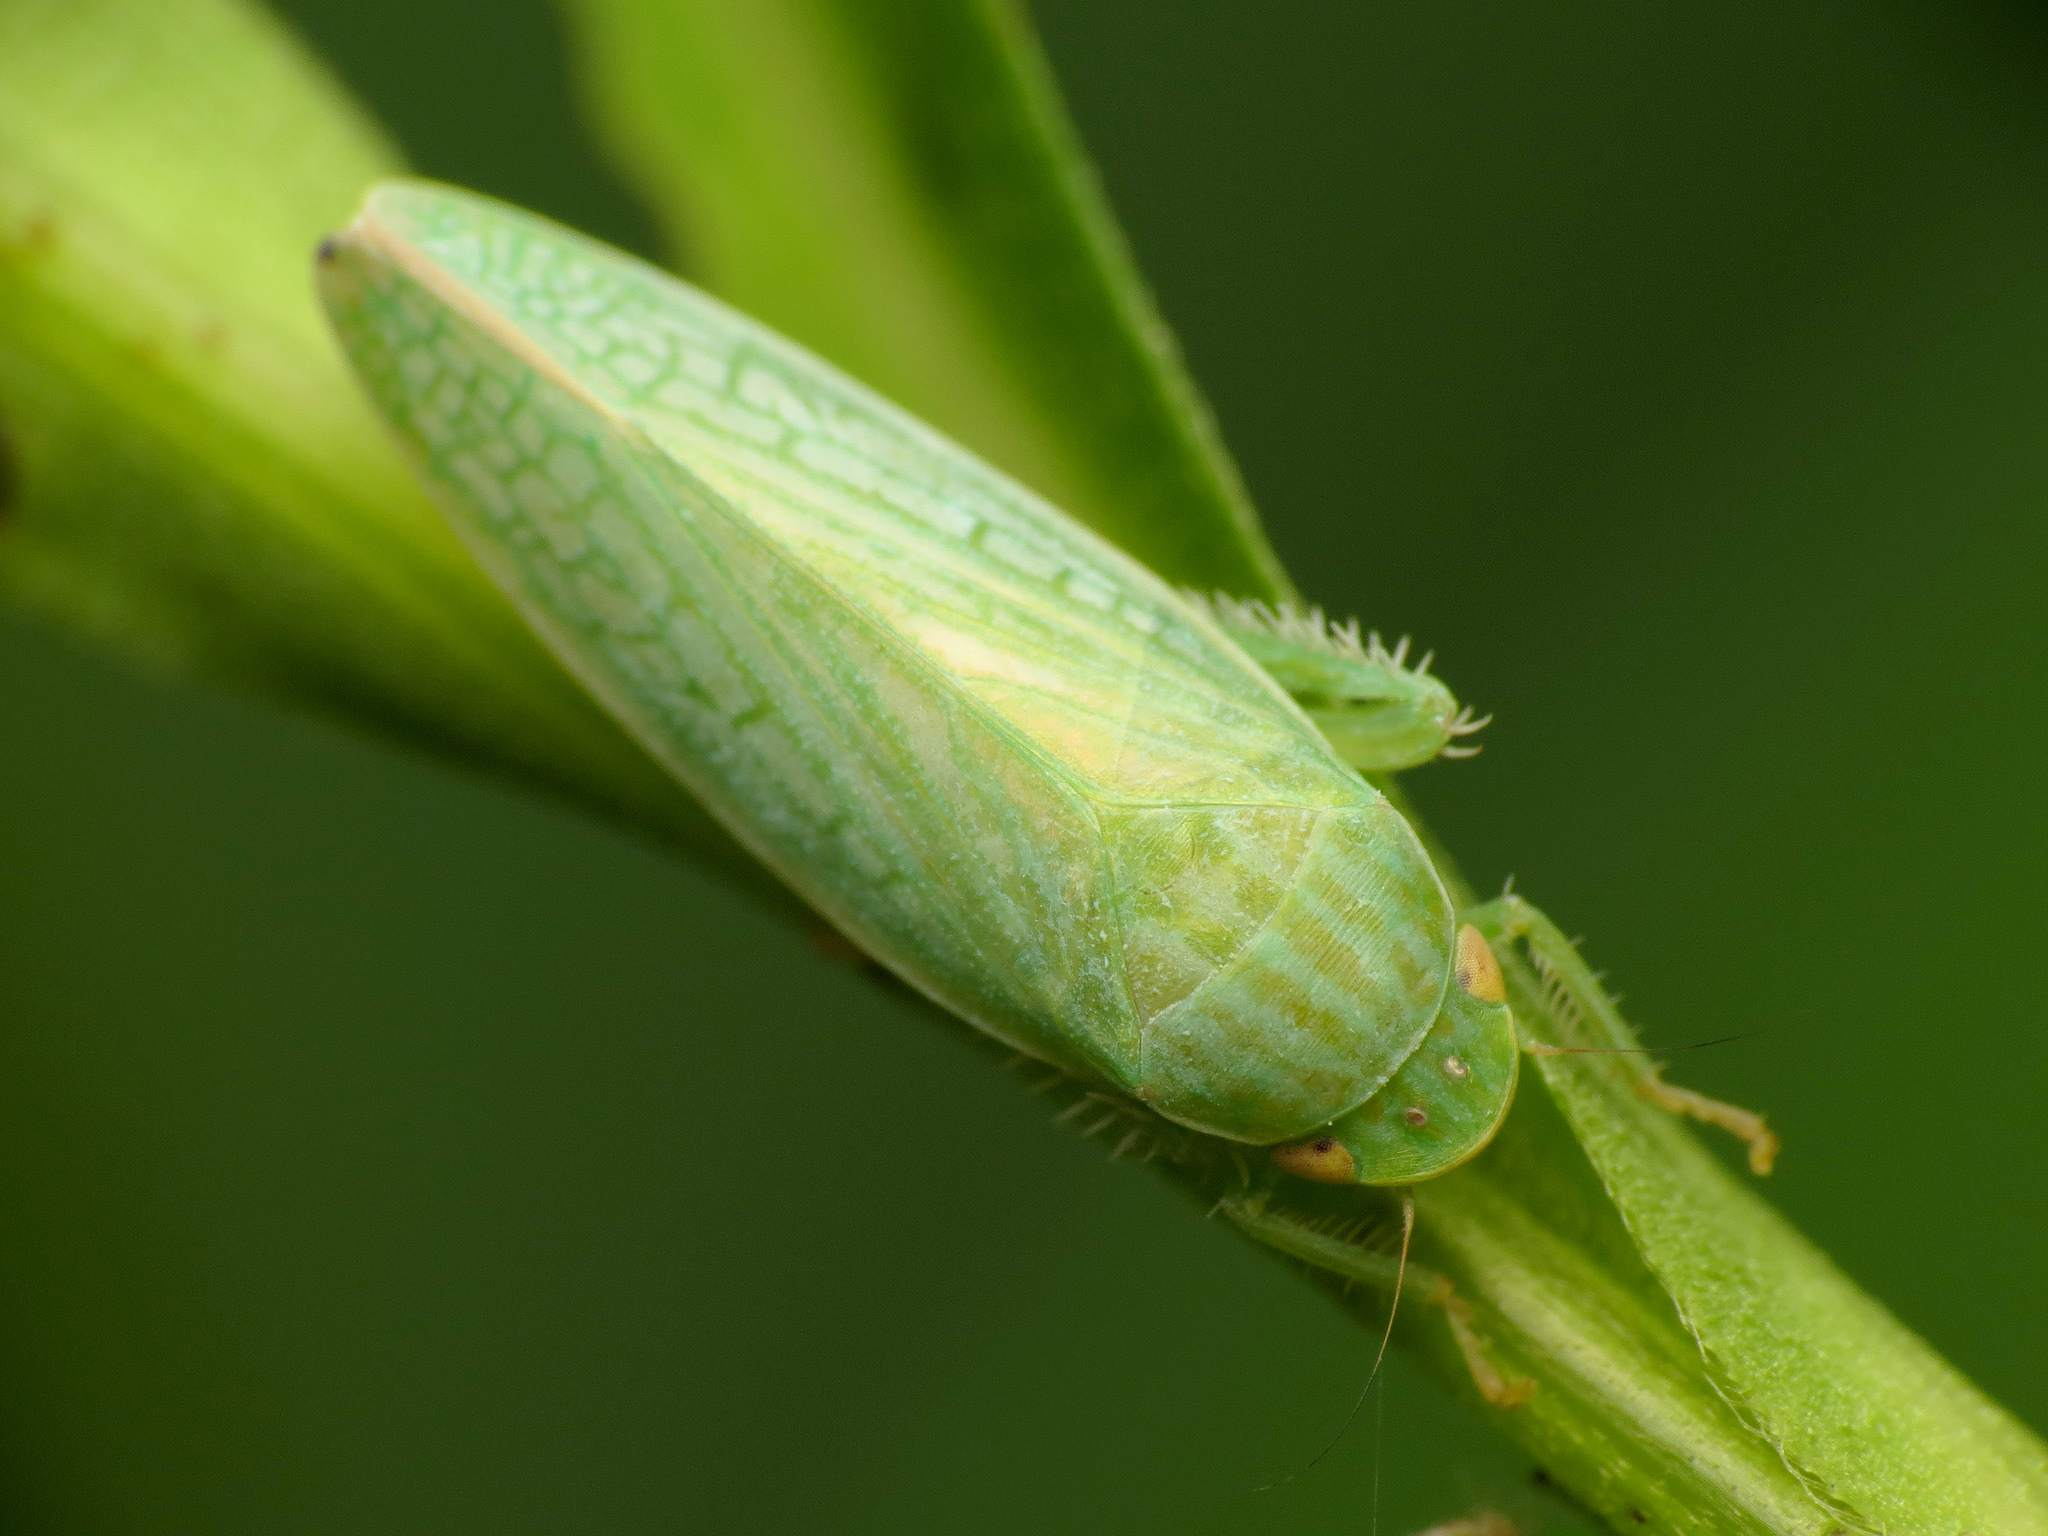 Green Leafhopper. (Cicadellidae) en una planta